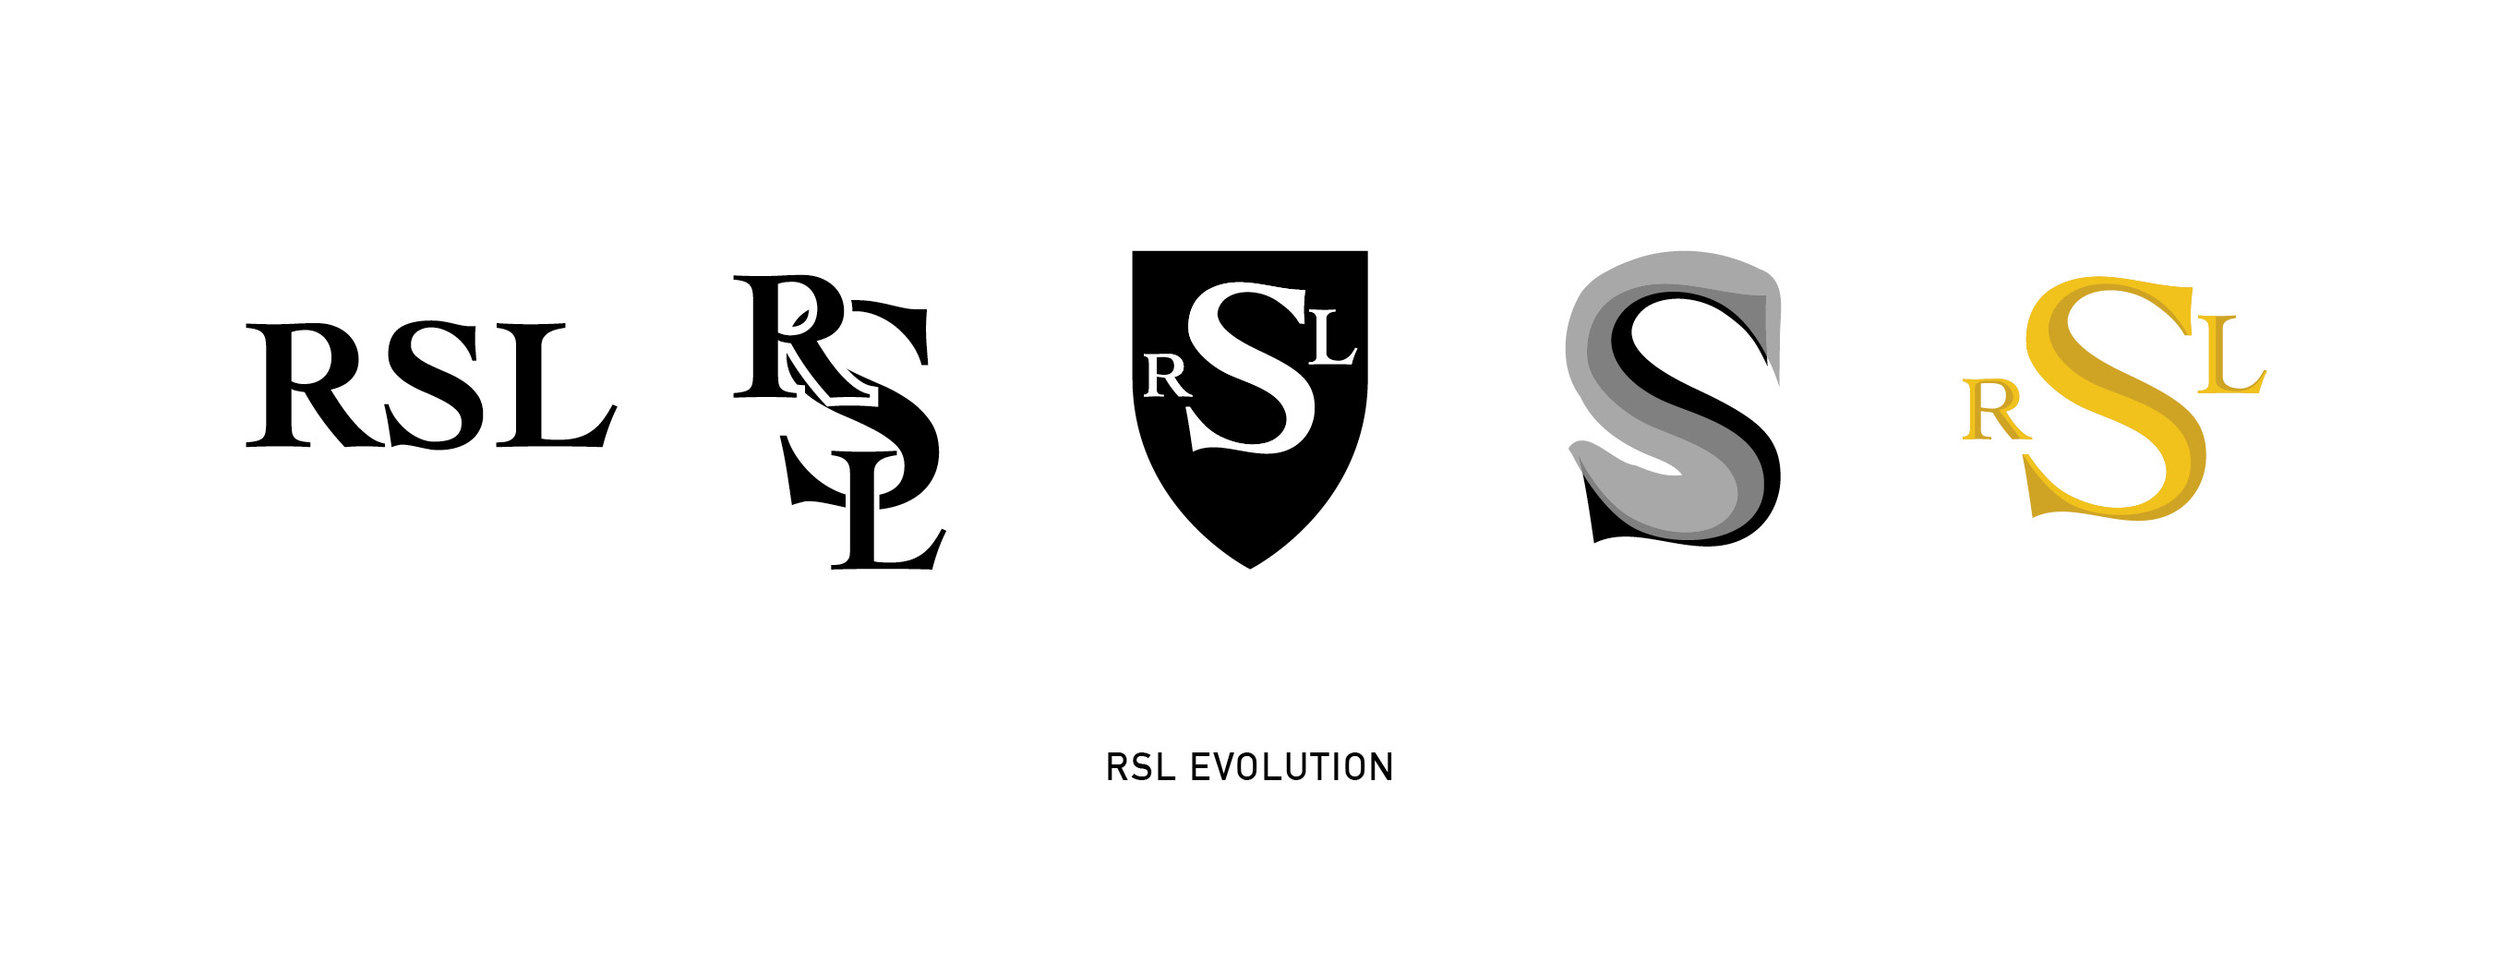 RSL - RSL Evo.jpg